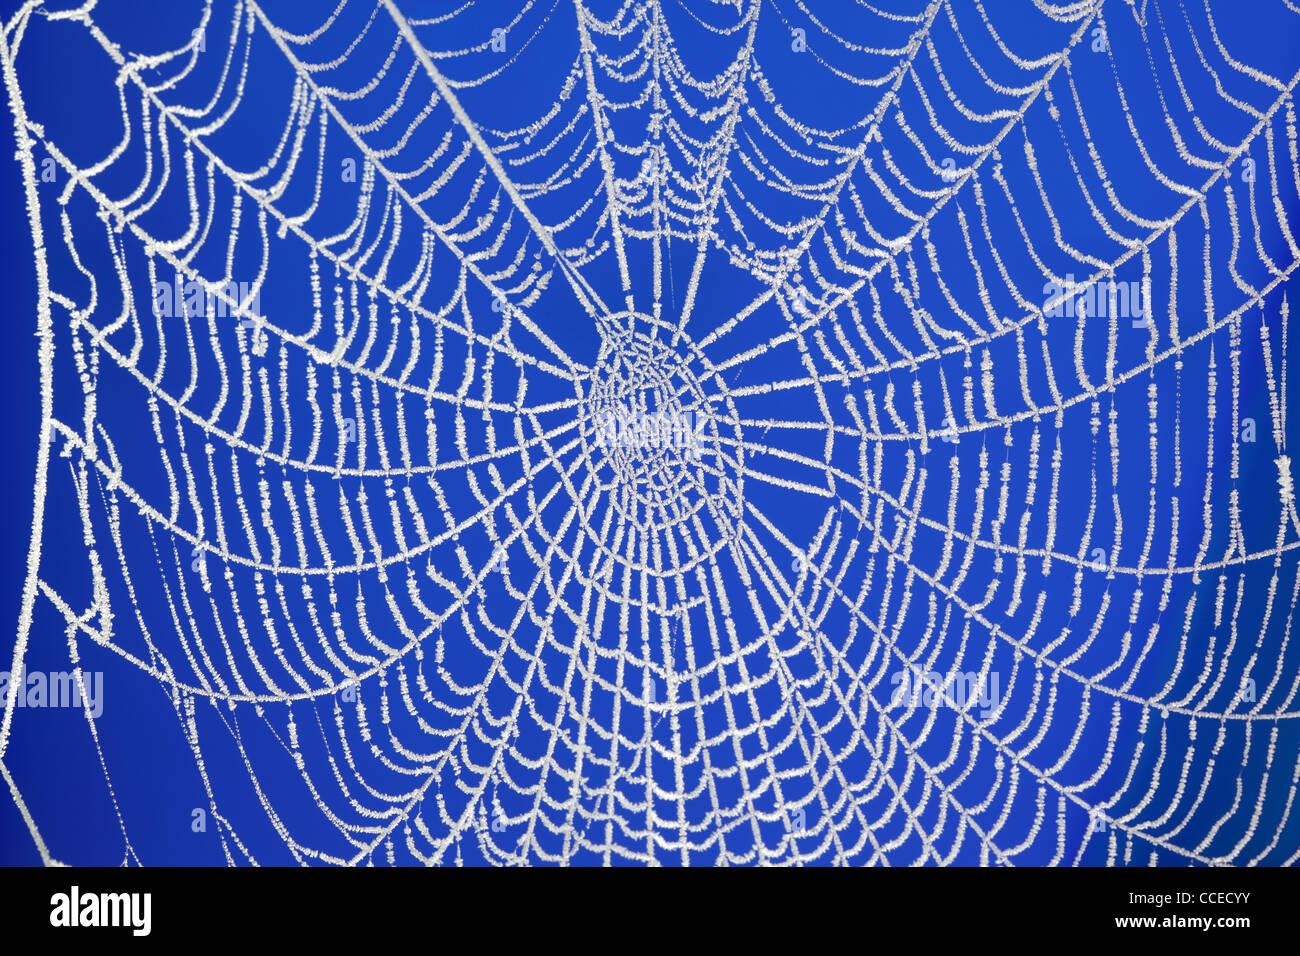 Frozen spider web - Stock Image